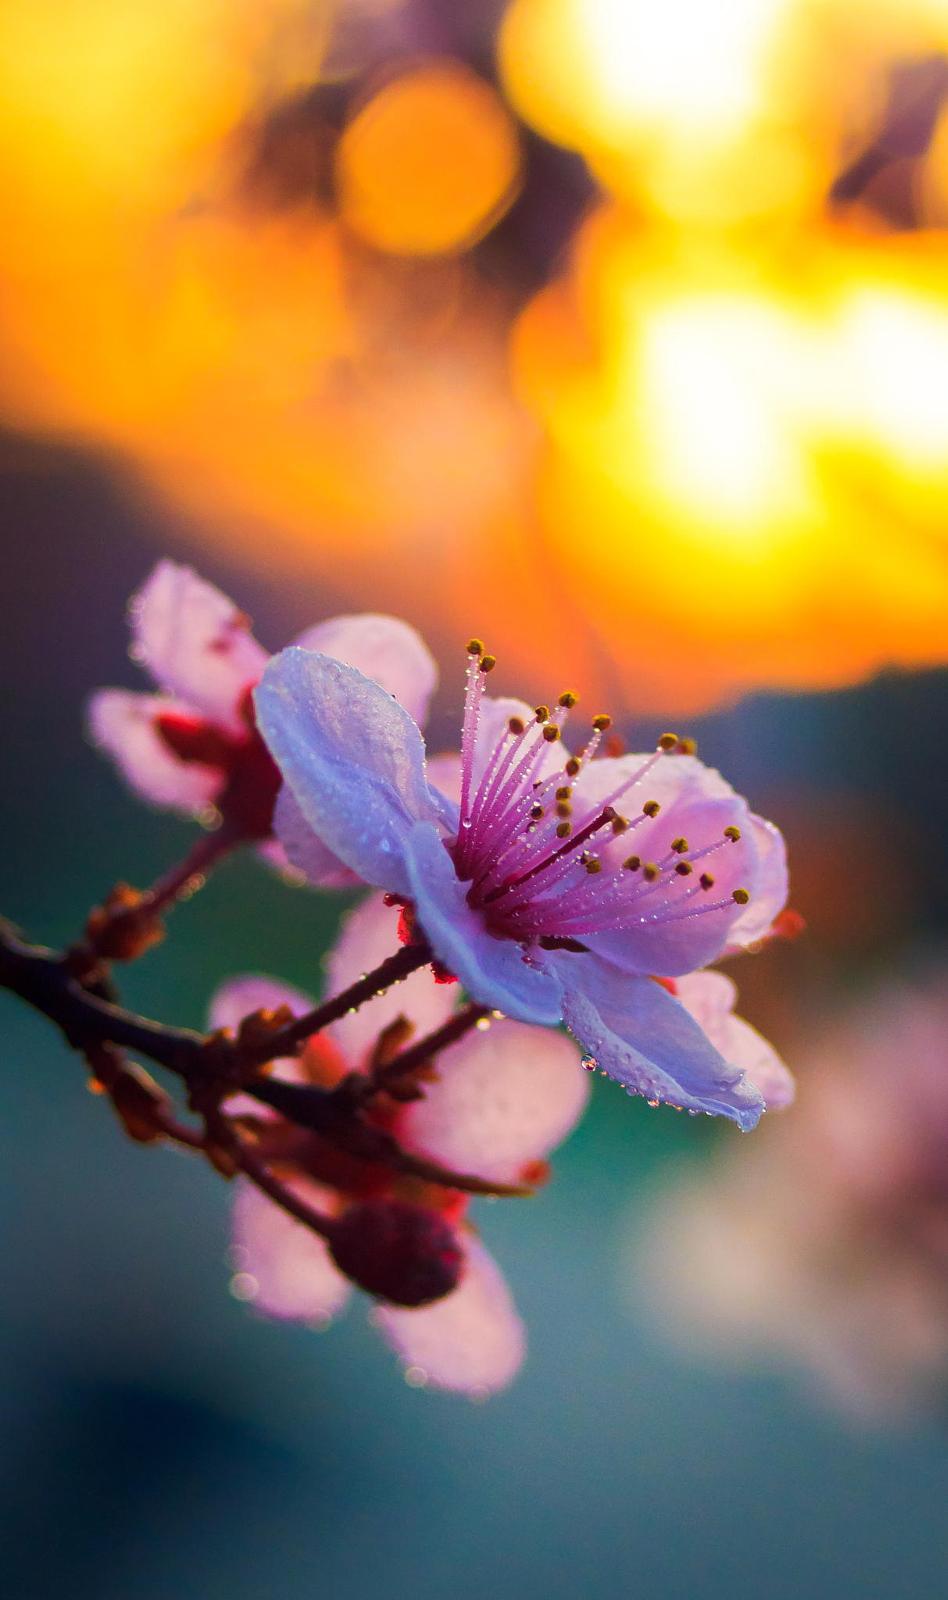 Cherry blossom mirroring the sunset